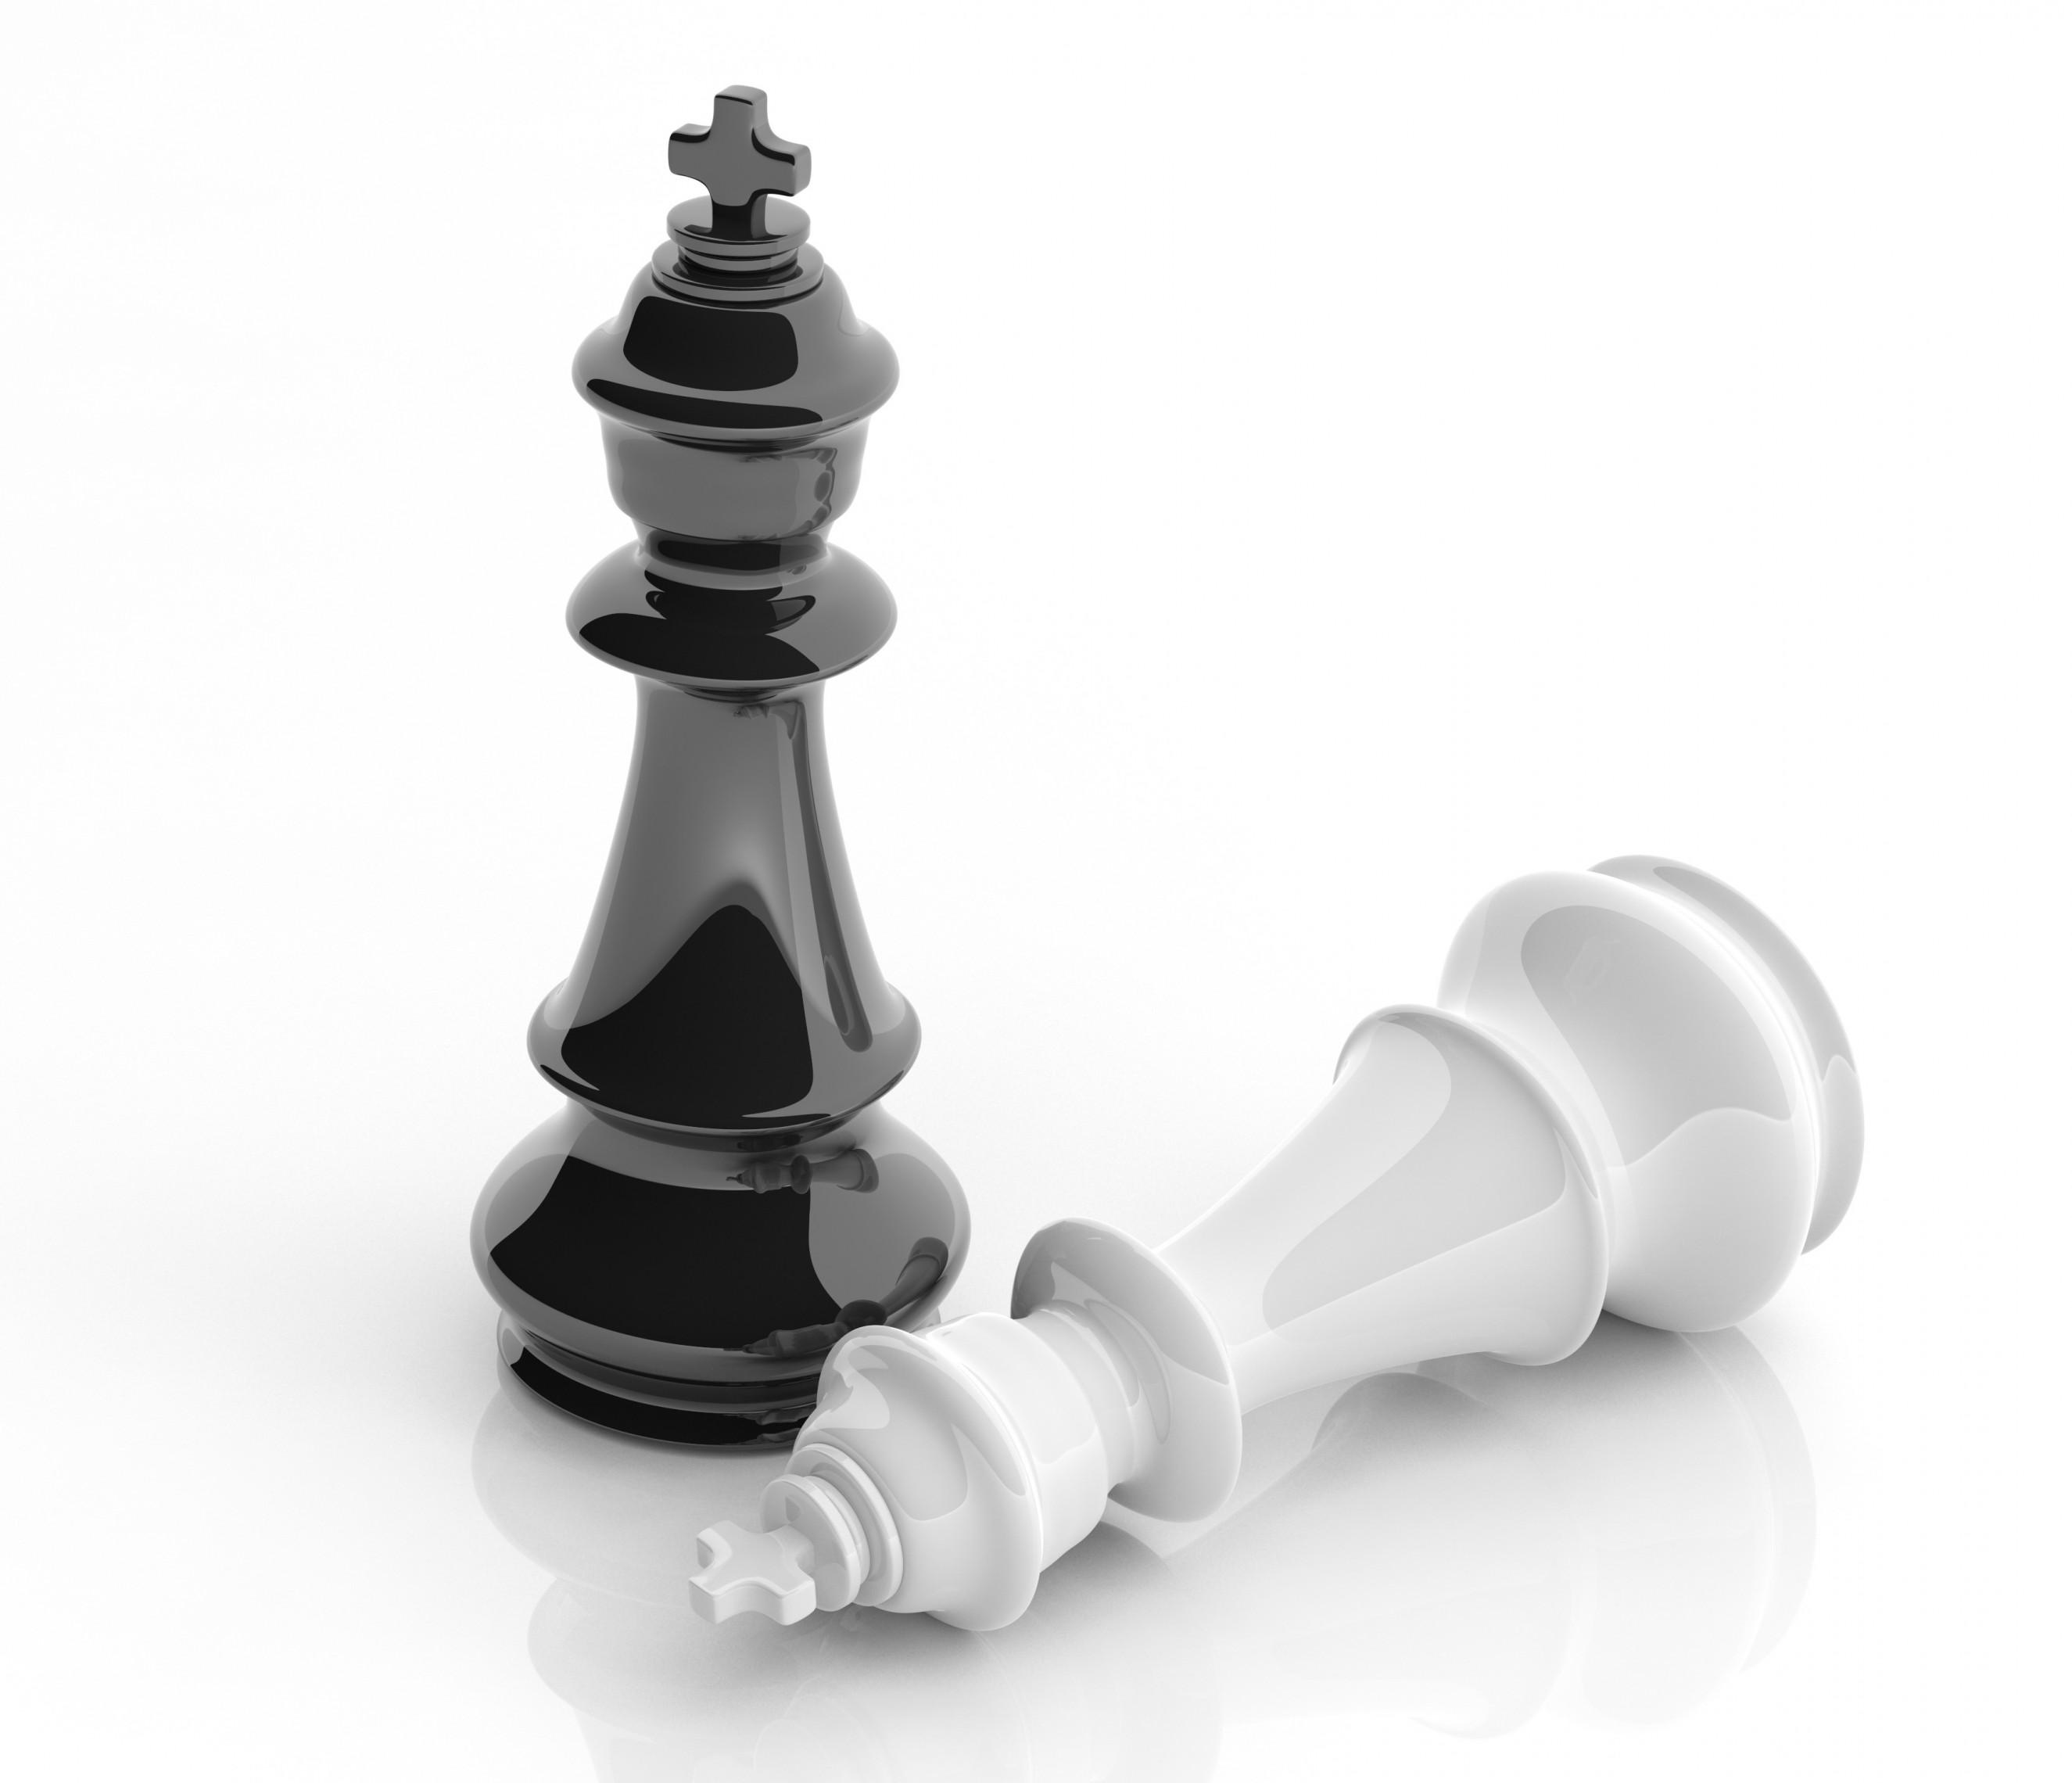 Accumen Accountants and Business Advisors Advisory